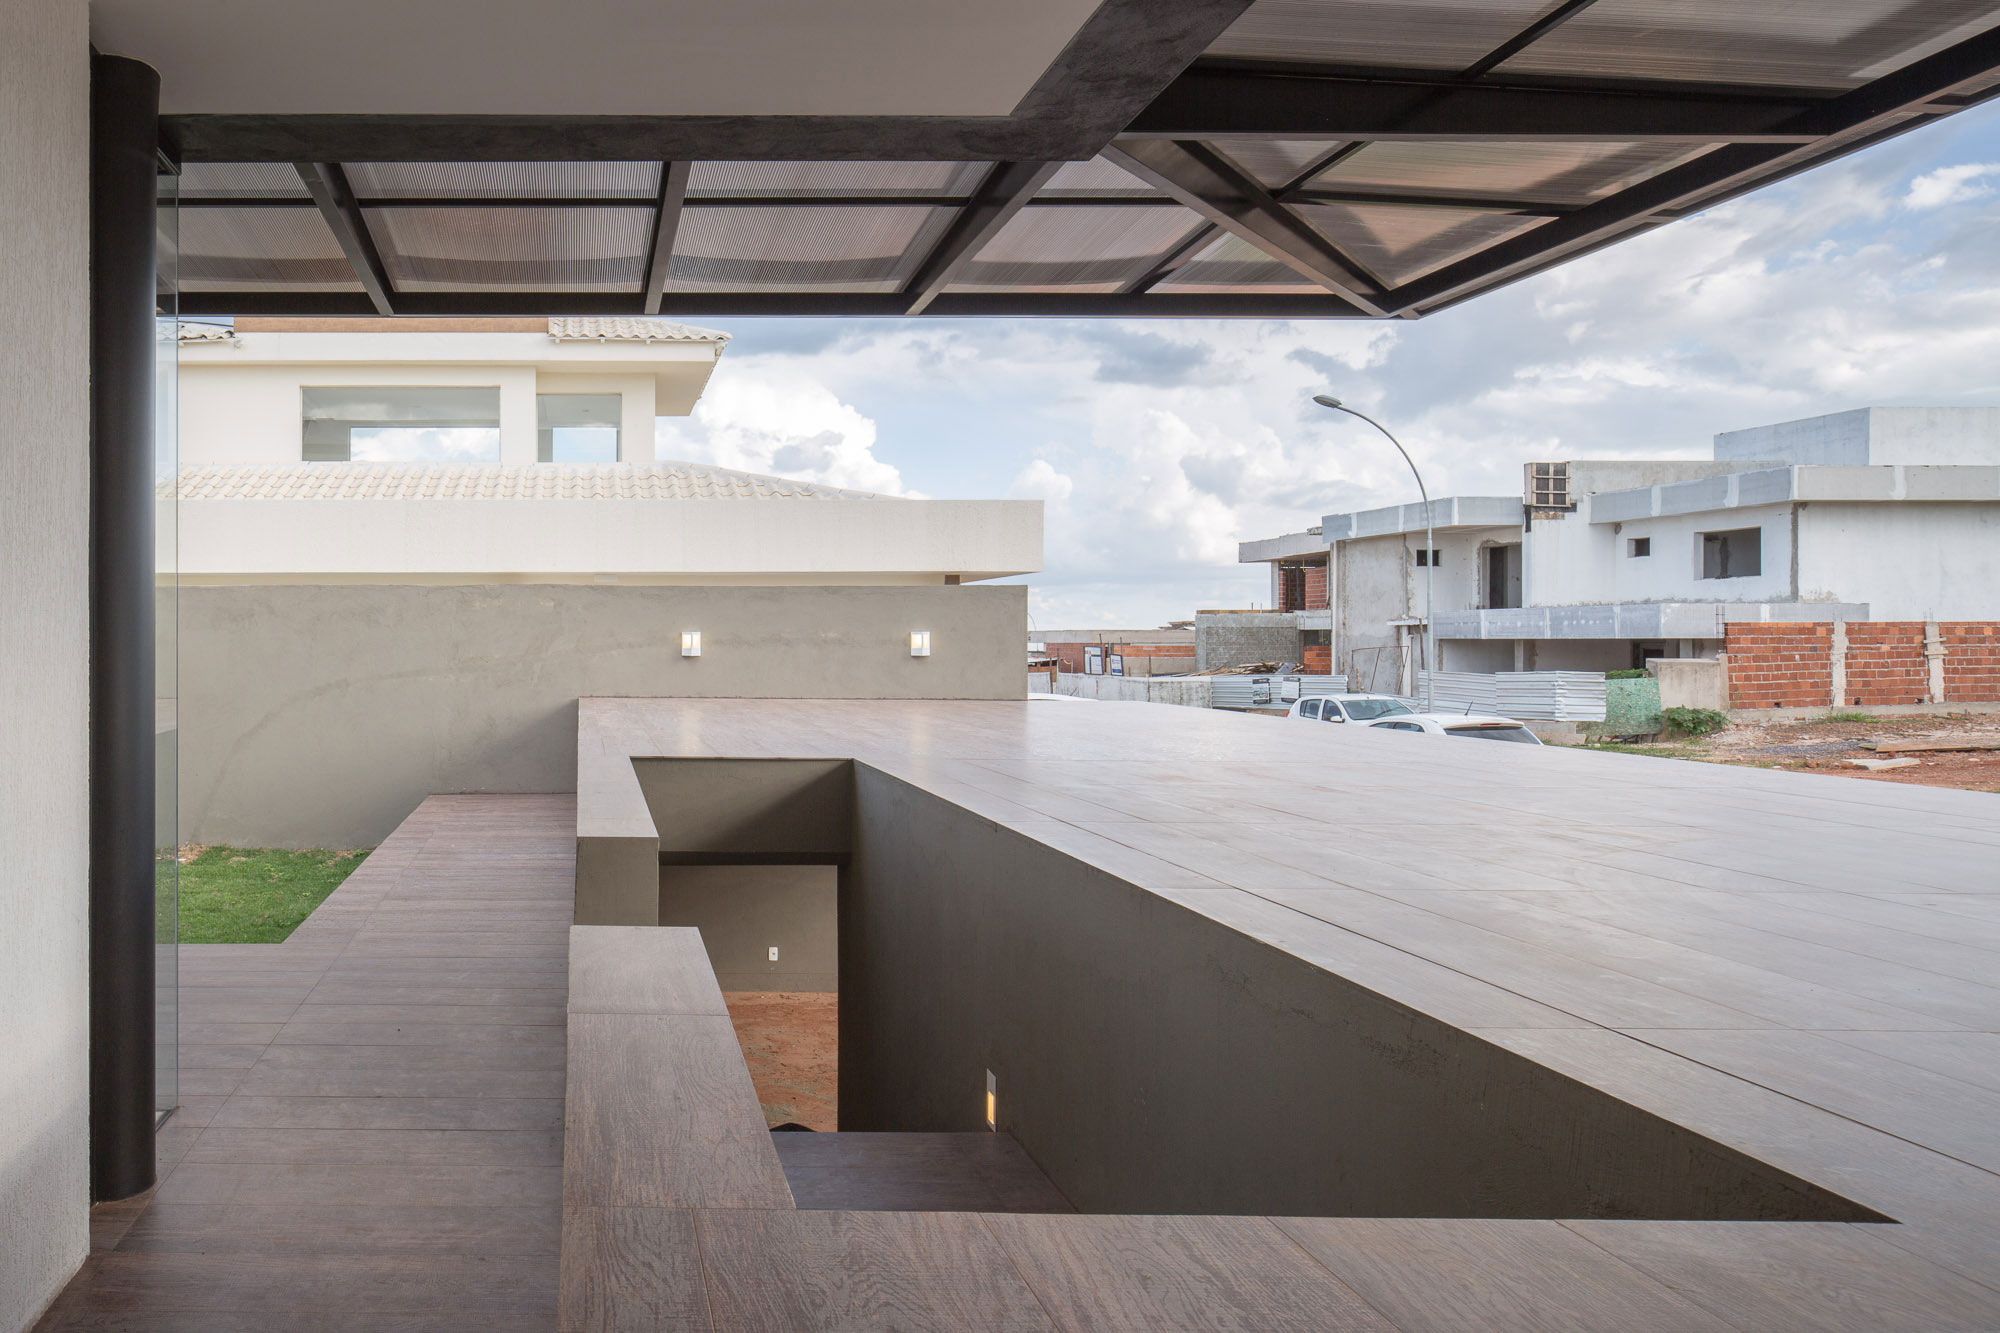 Casa MCO by Esquadra|Yi-08